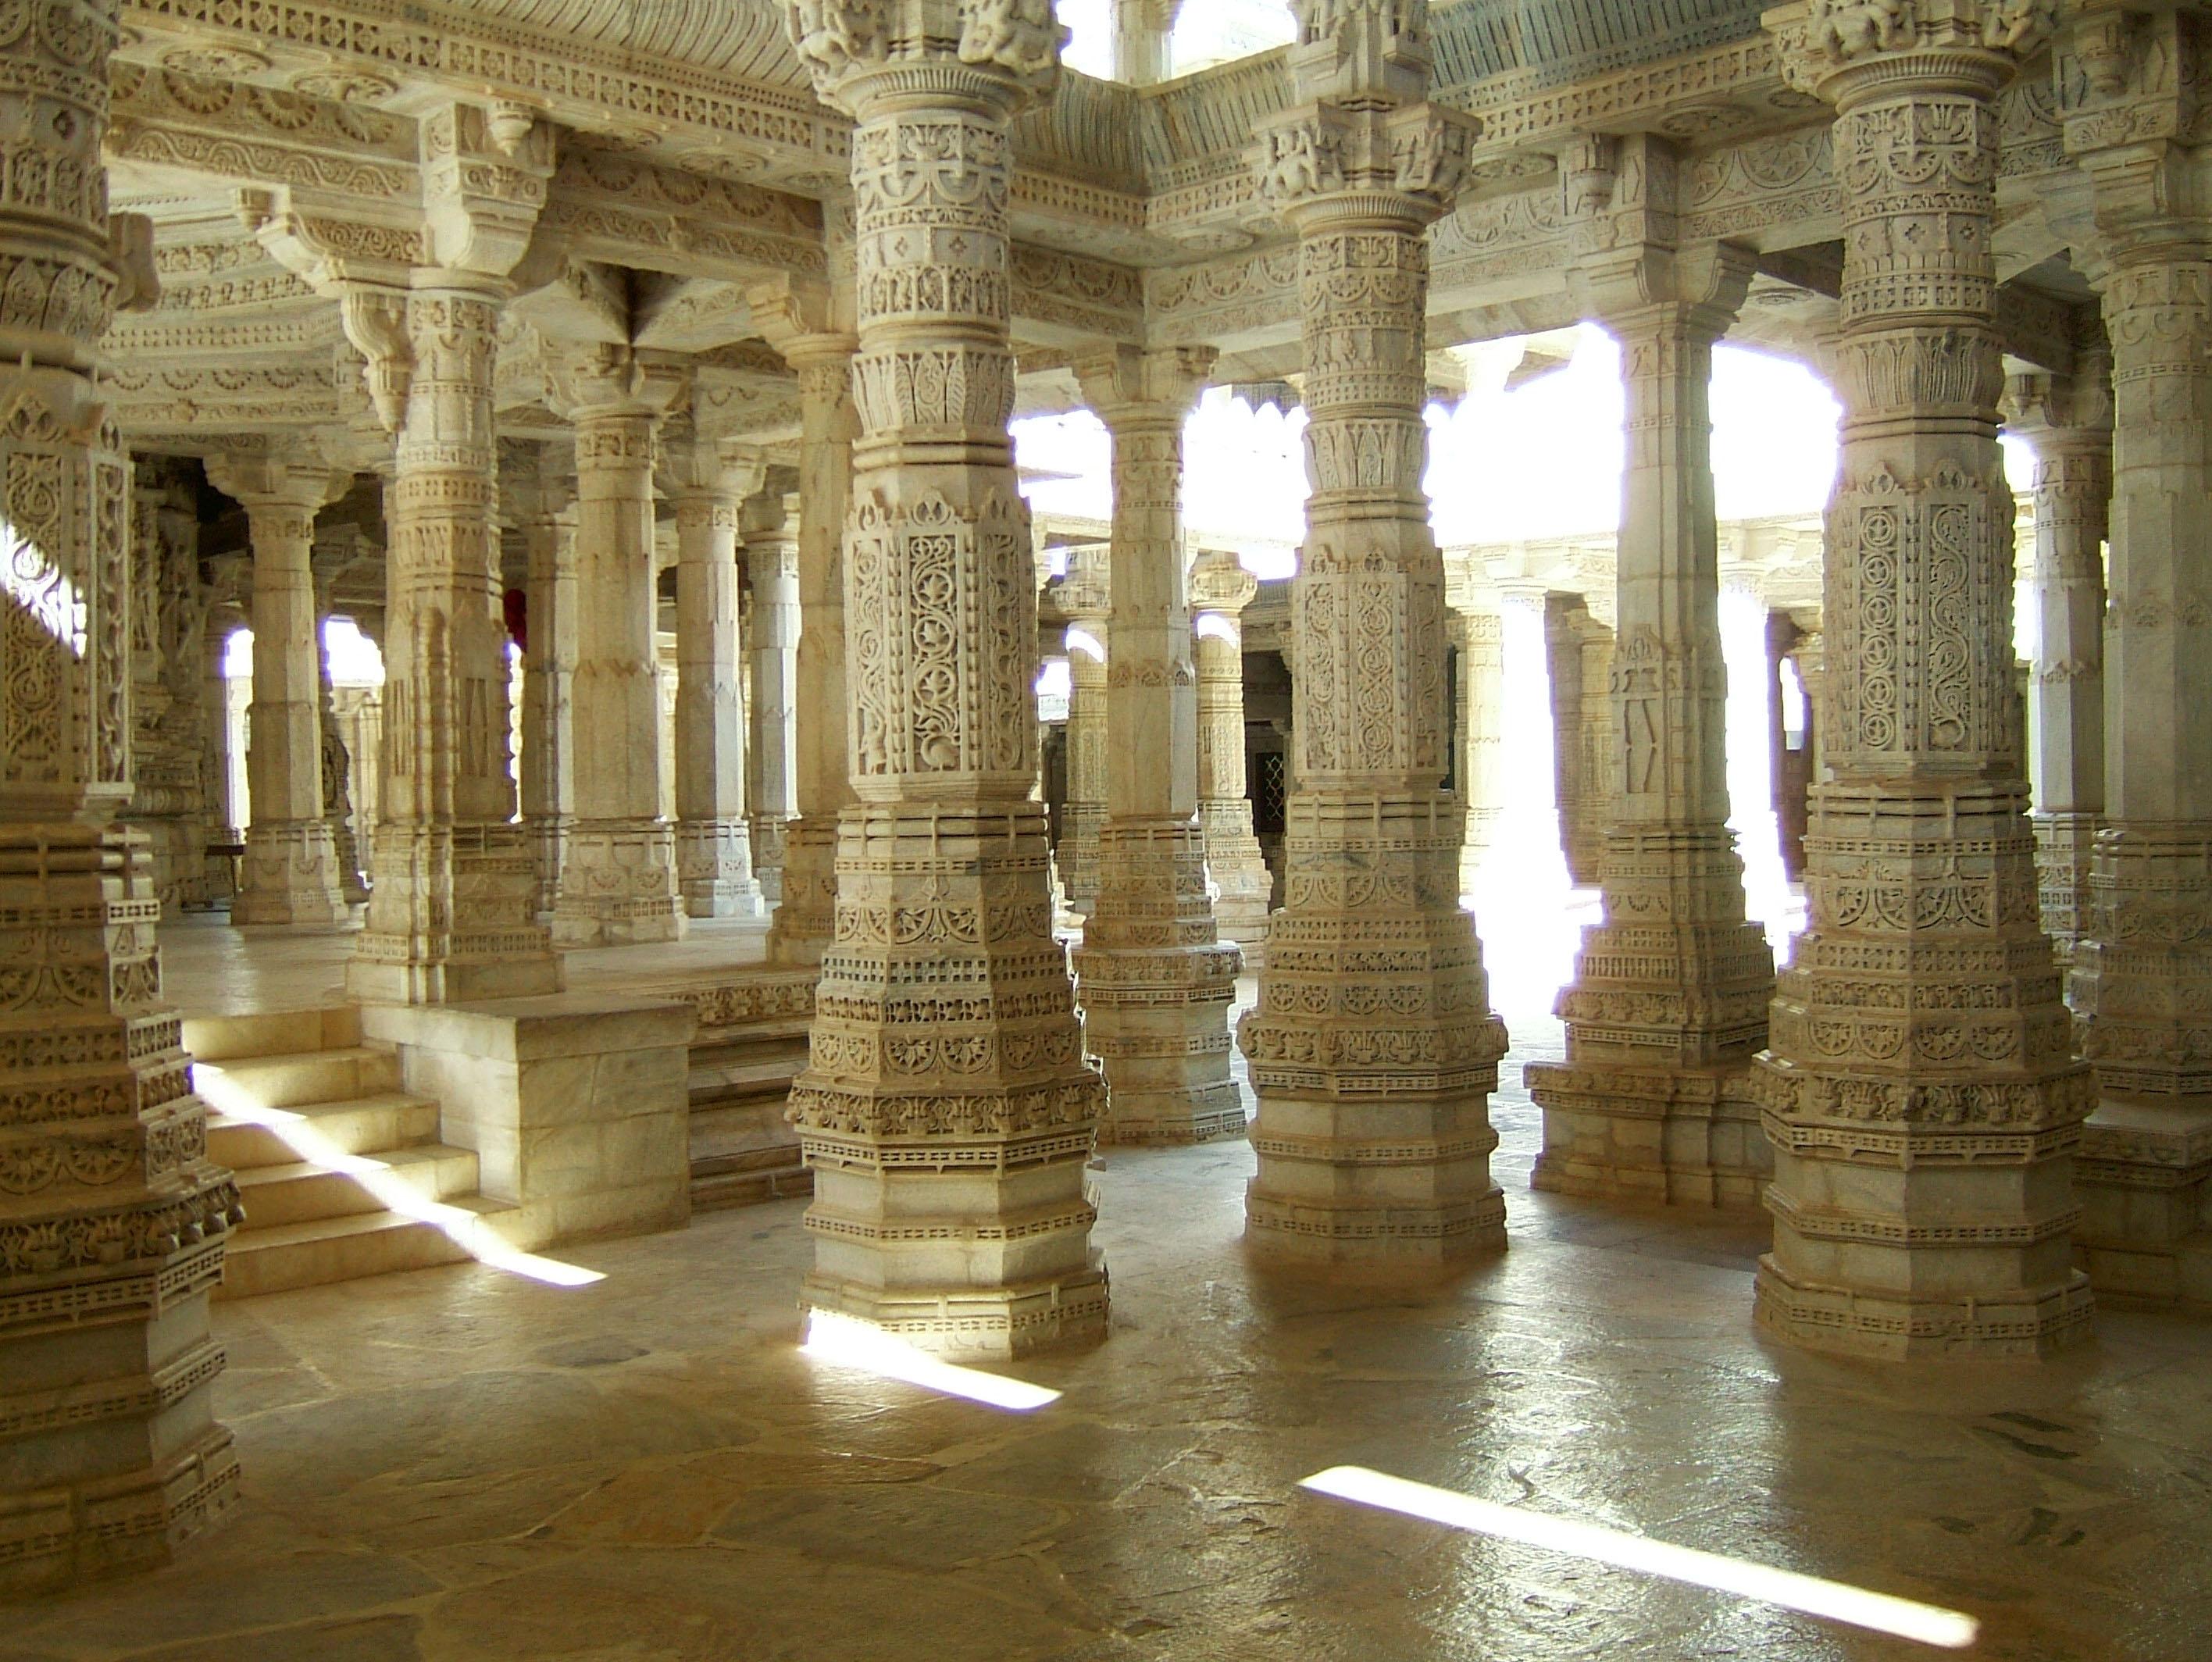 Ranakpur India  City pictures : Description Ranakpur Jain Marble Temple pillars Frescoes Apr 2004 02 ...